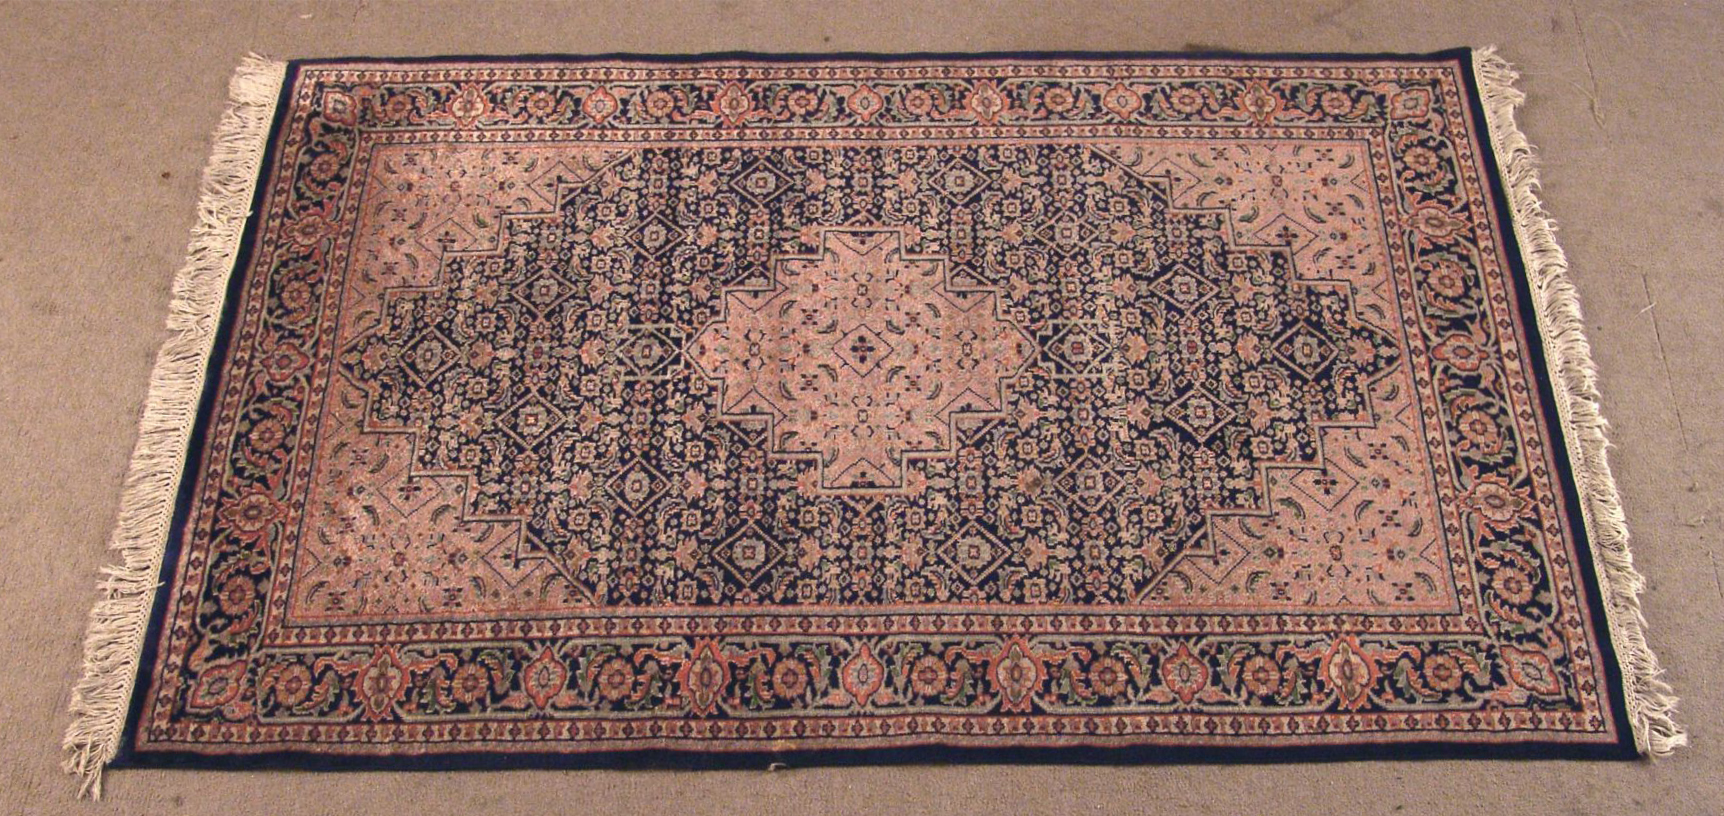 Bgw remate 222 alfombra gek htm gendata for Alfombra persa azul